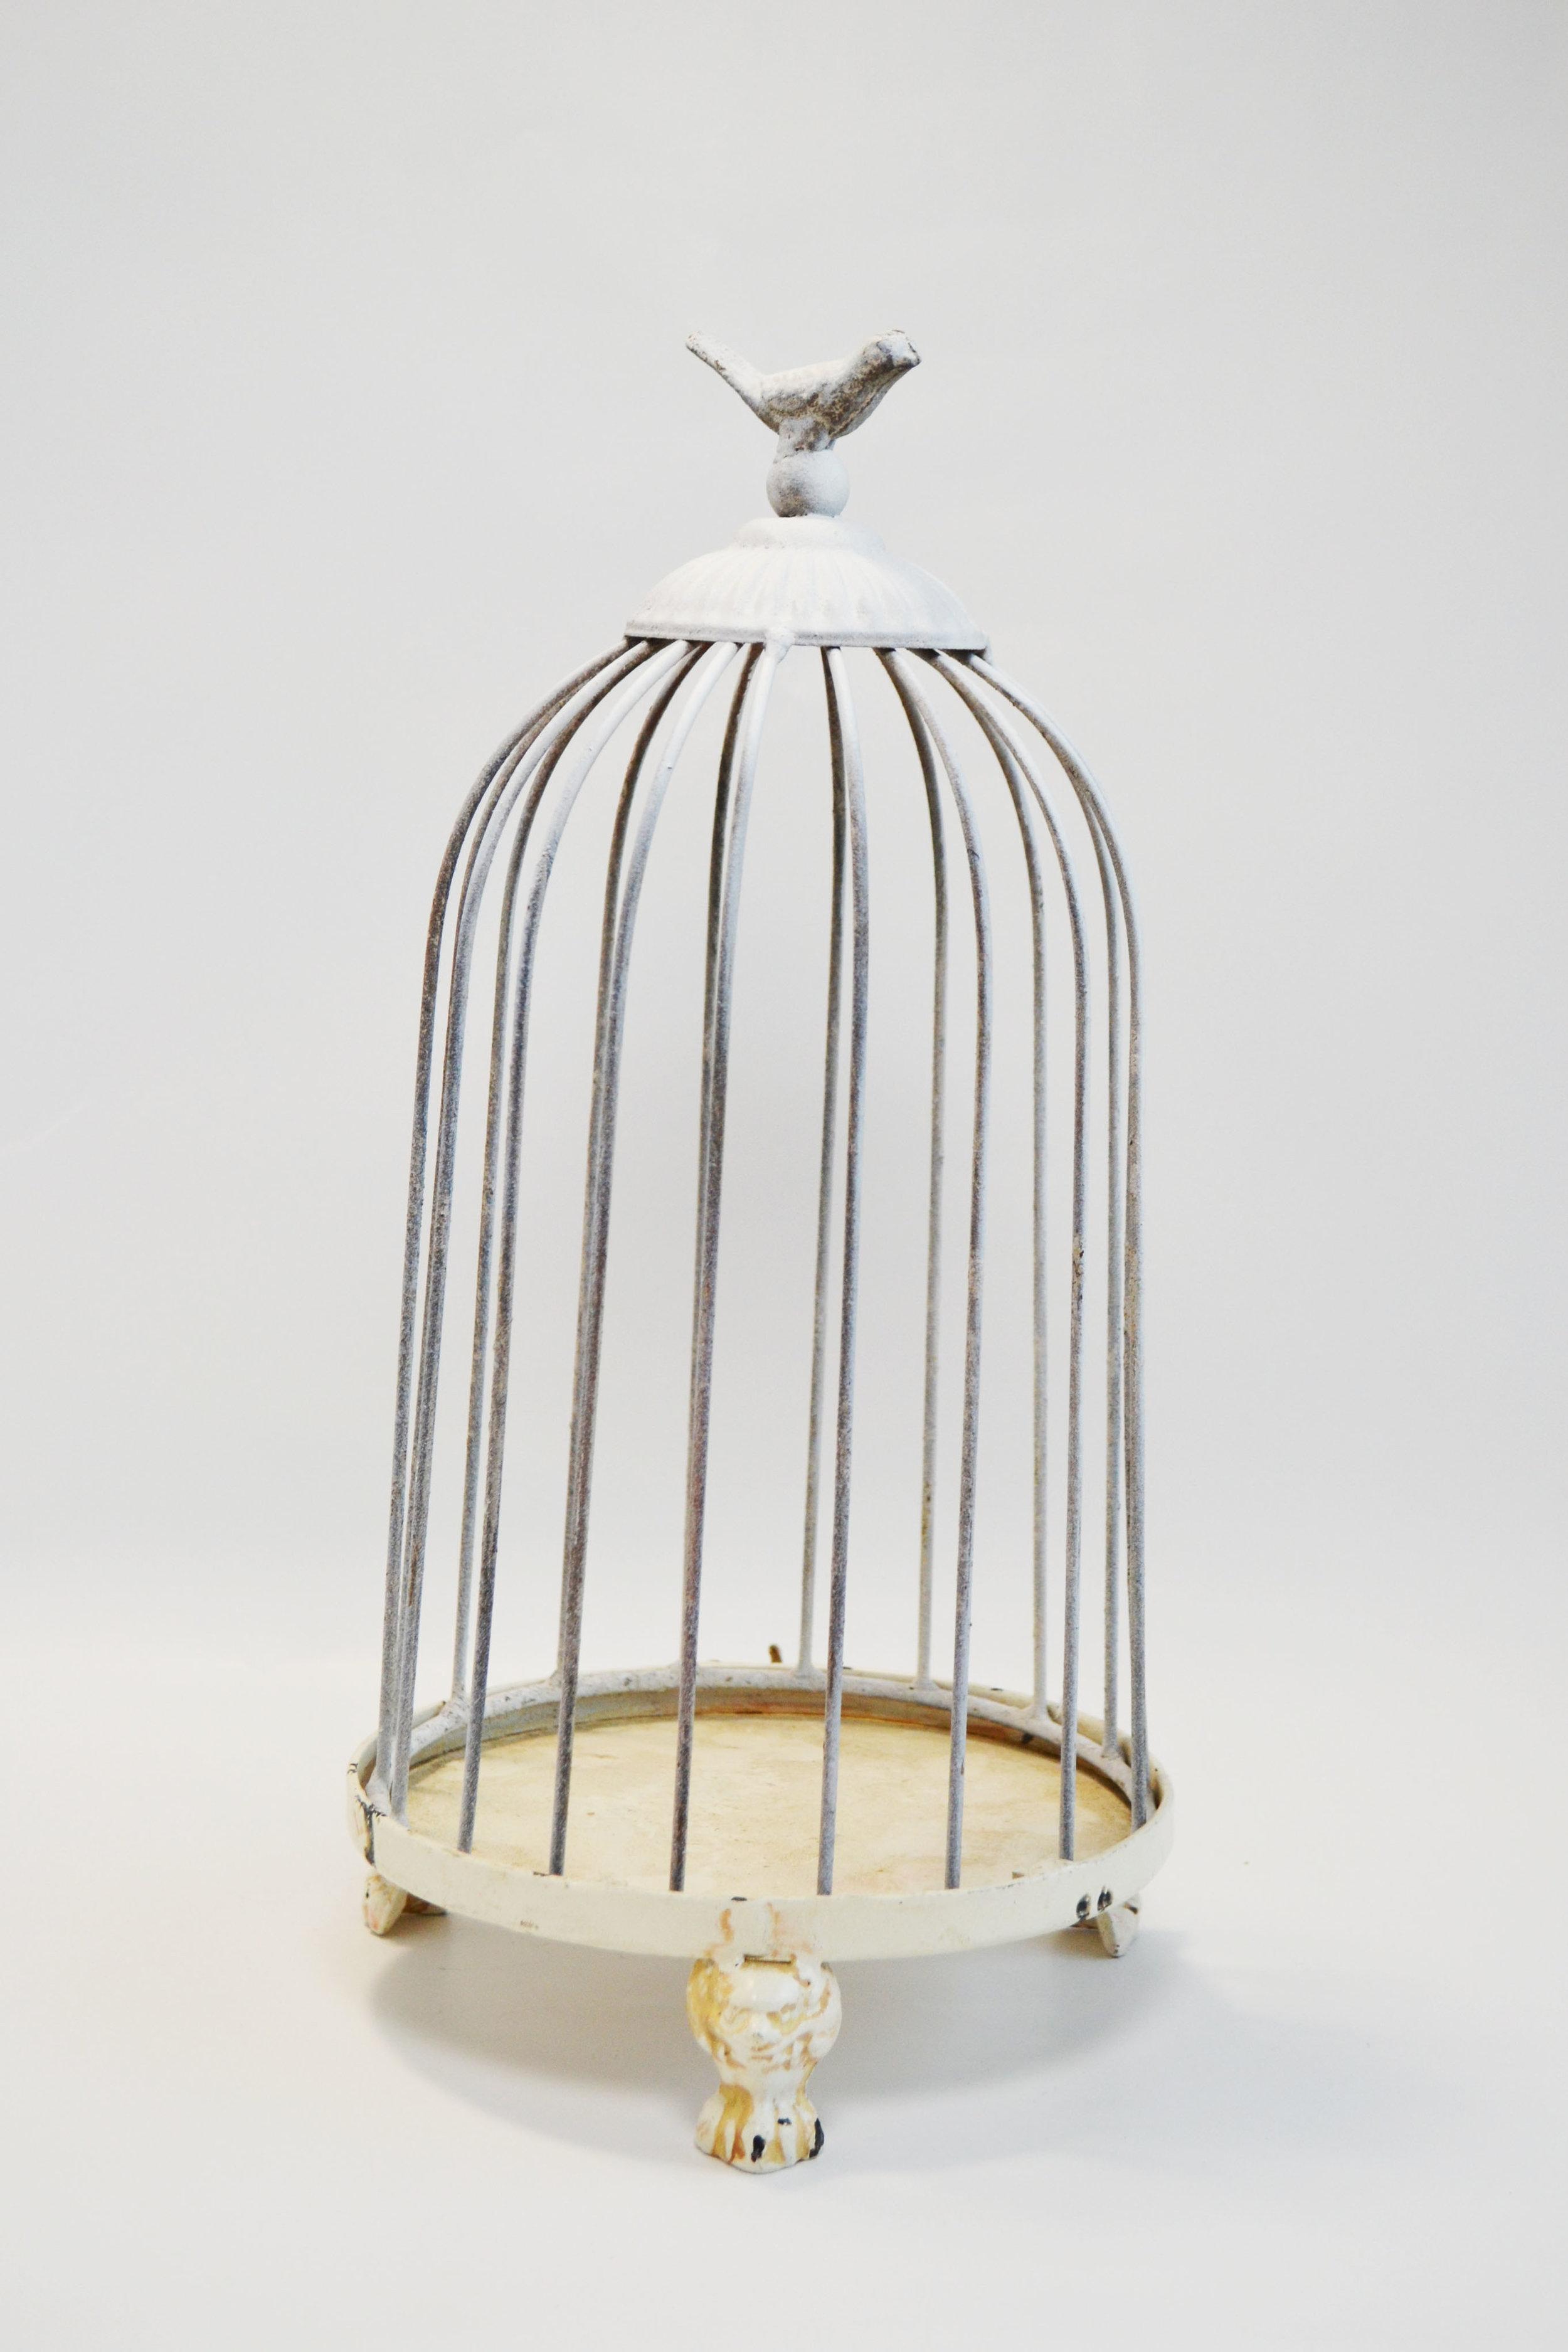 large bird cage   Quantity: 3  Price: $16.00